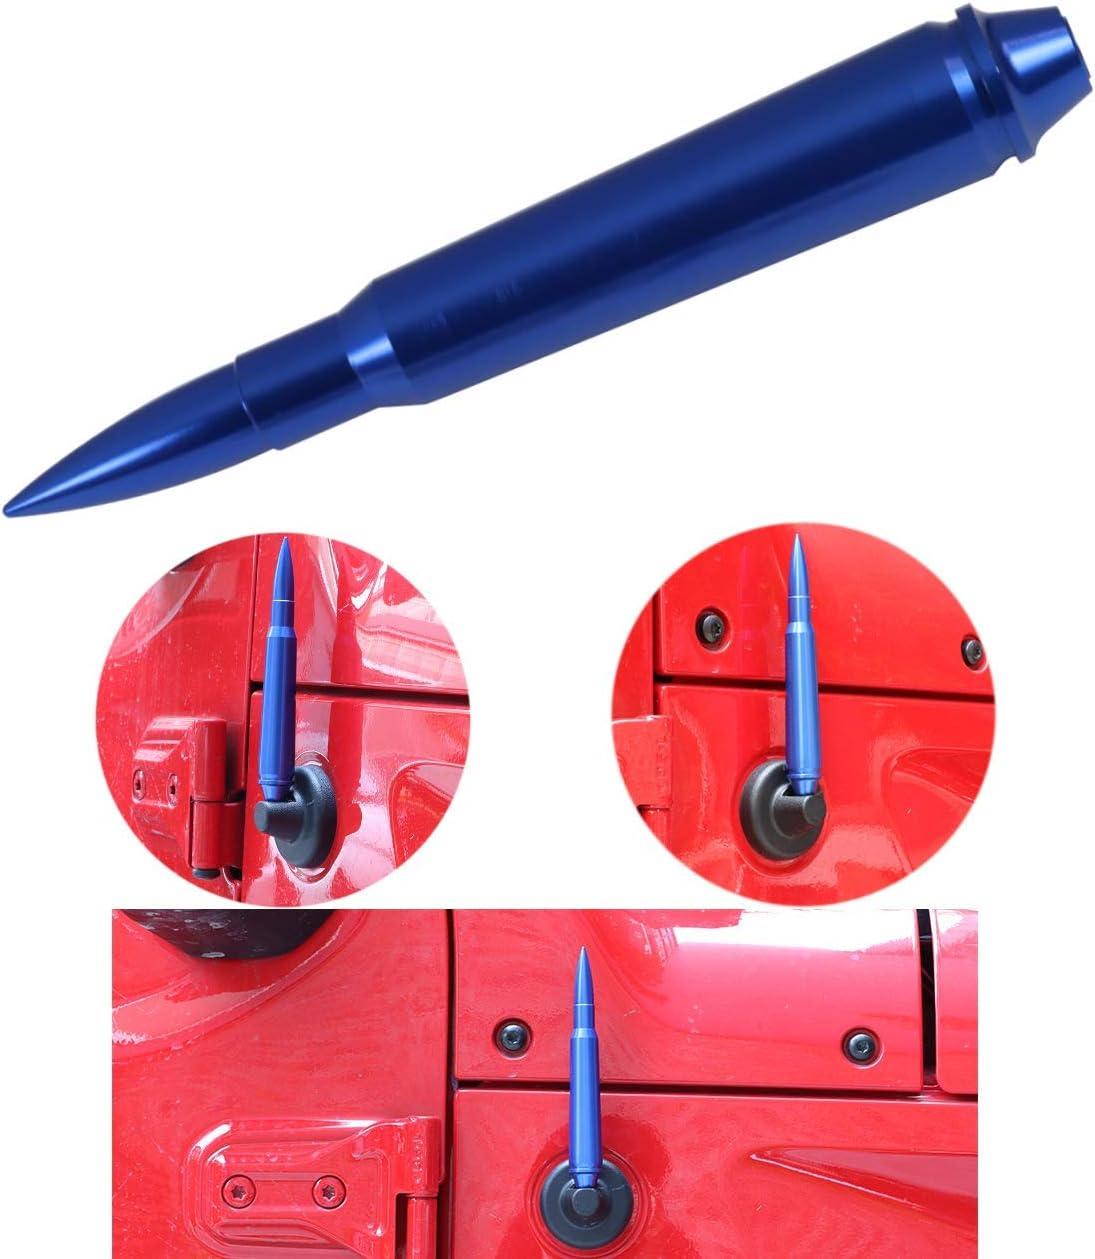 KOLEMO 5.7 Aluminum Bullet Antenna FM//AM Signal Reception for Jeep Wrangler JK 2007-2018 /& Jeep Wrangler JL 2018-2019 /& Jeep Wrangler TJ 1997-2006 Blue